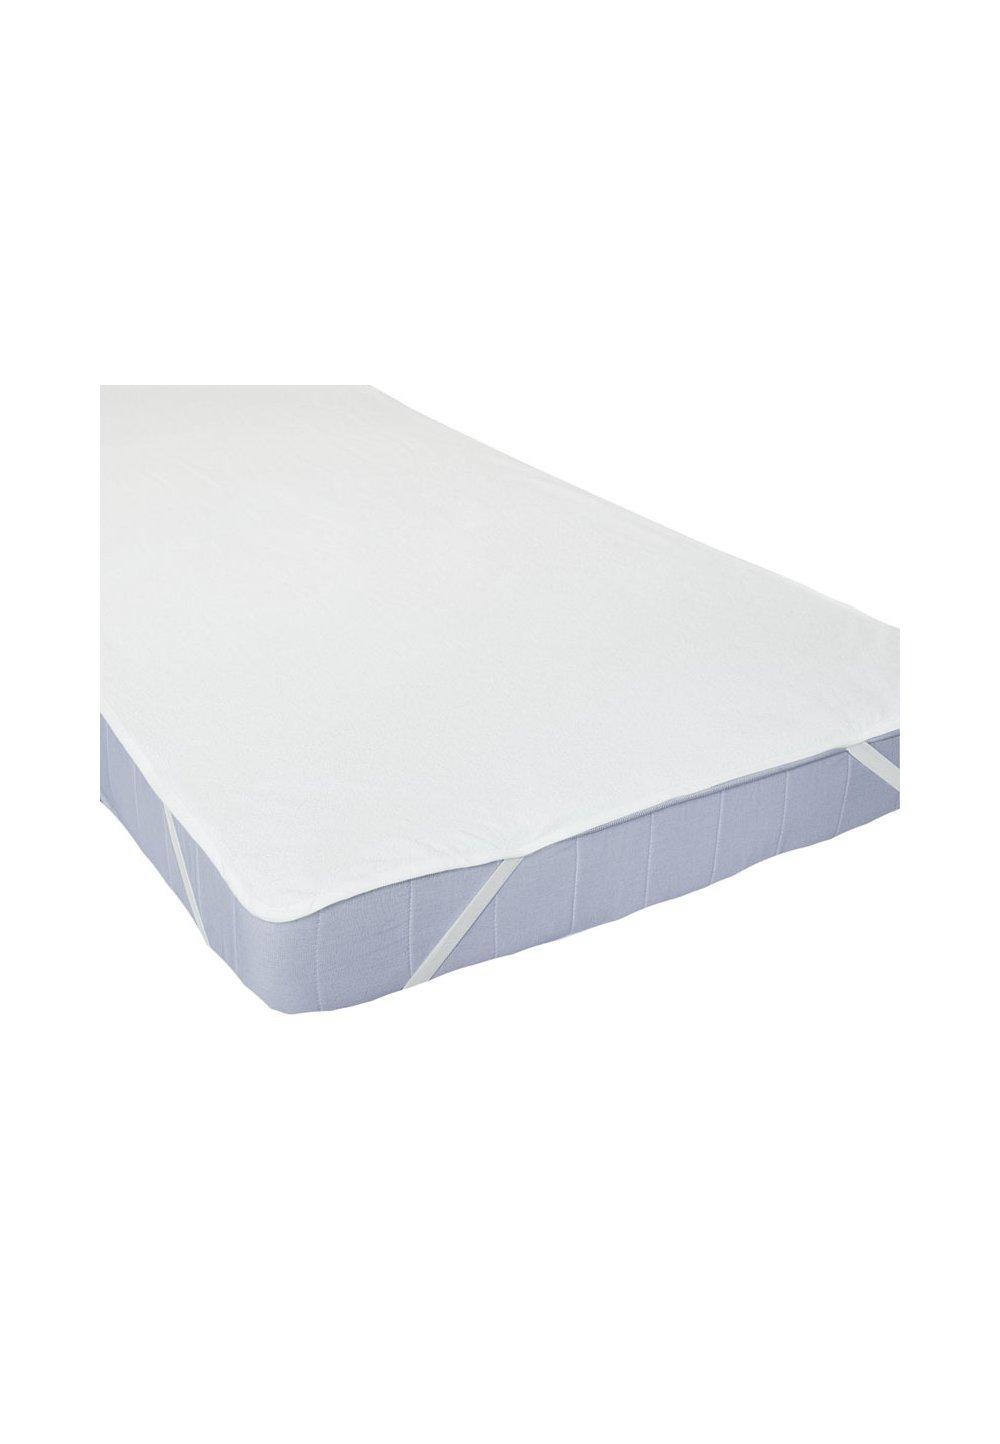 Protectie saltea impermeabila, 120x60cm imagine